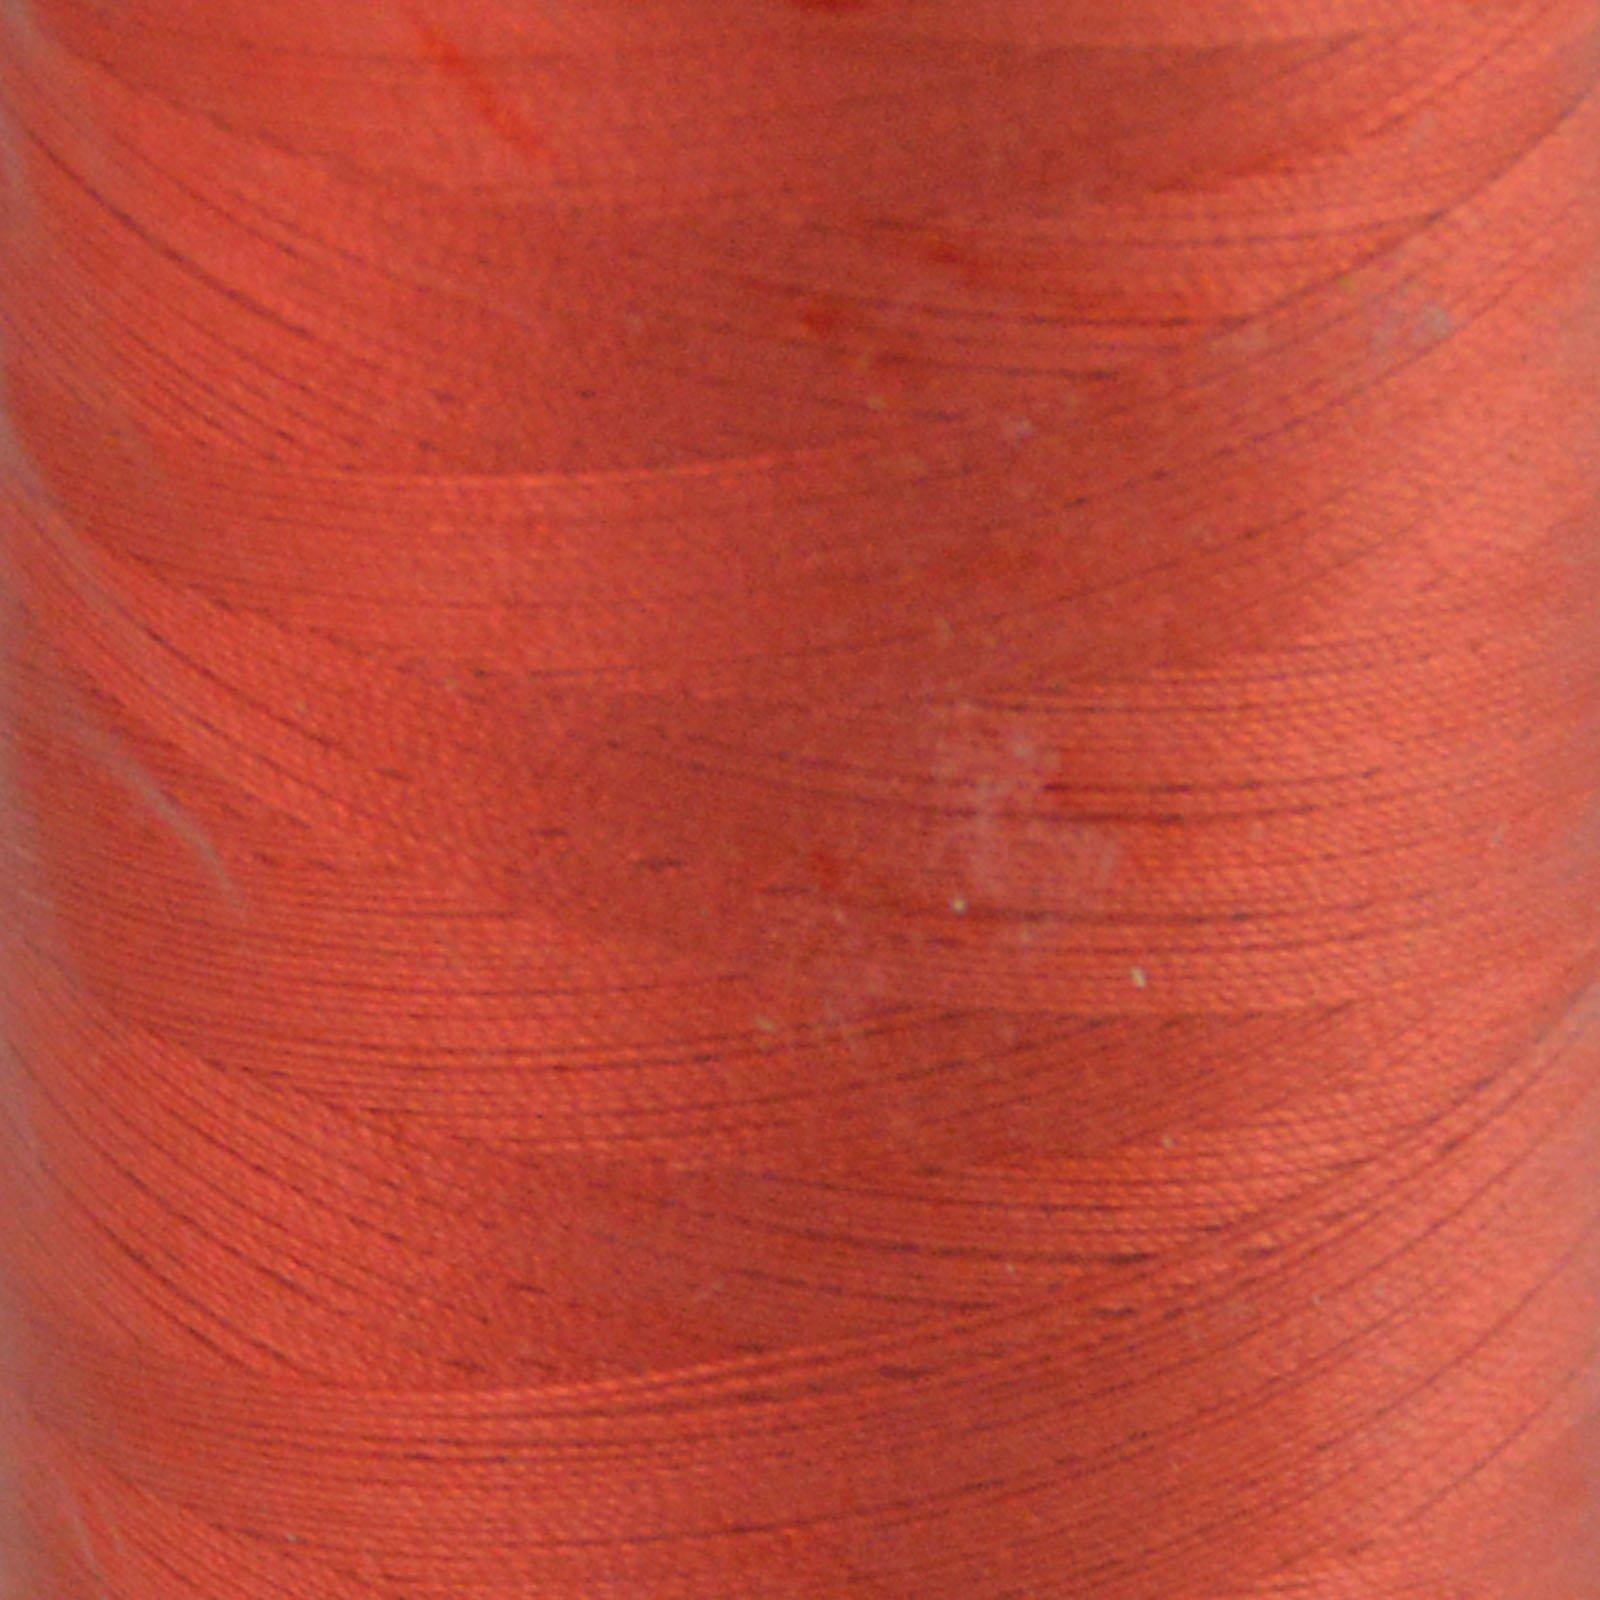 # 2277 Light Red Orange